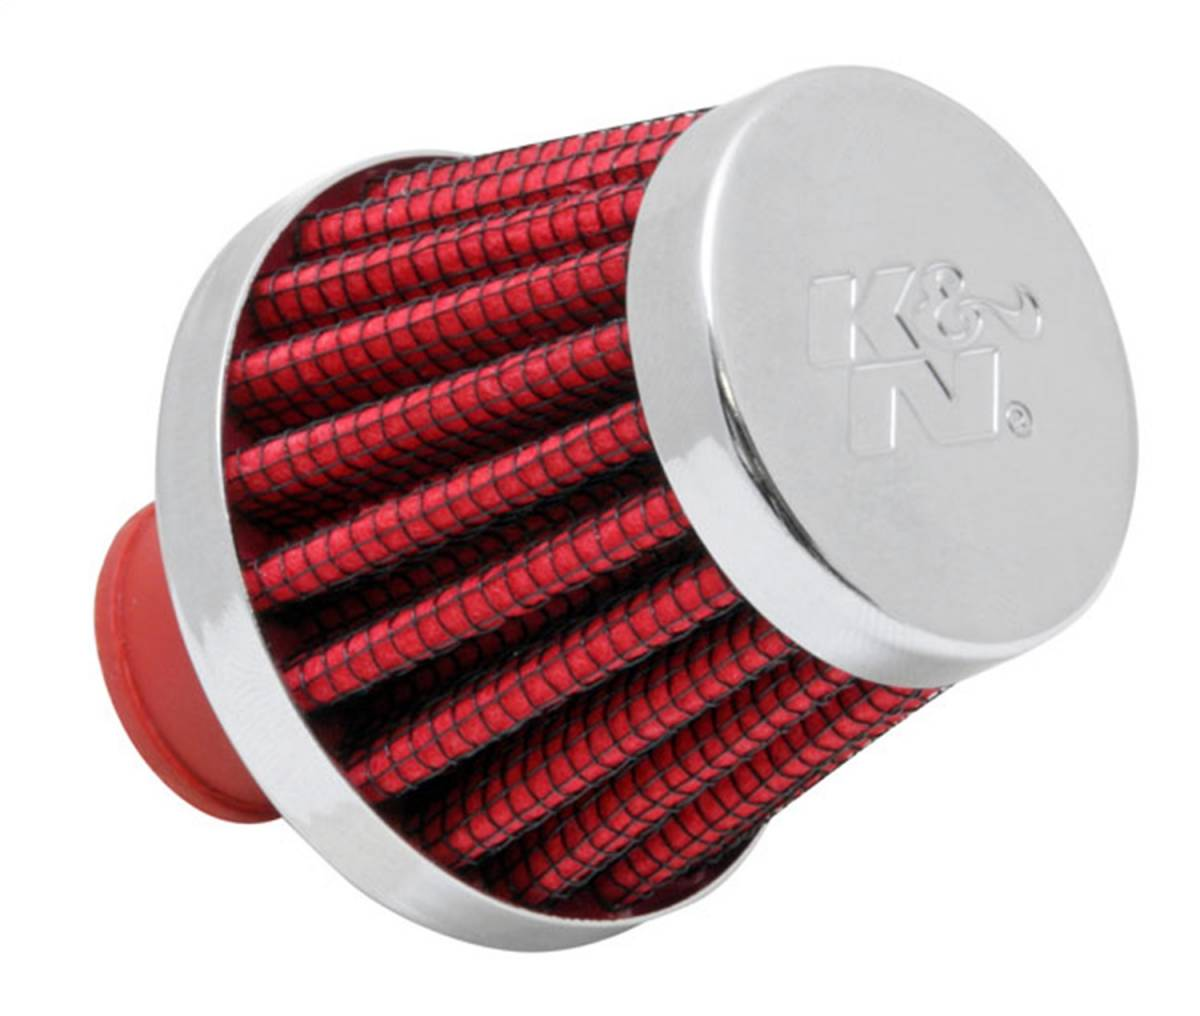 K/&N Filters 62-1515 Crankcase Vent Filter